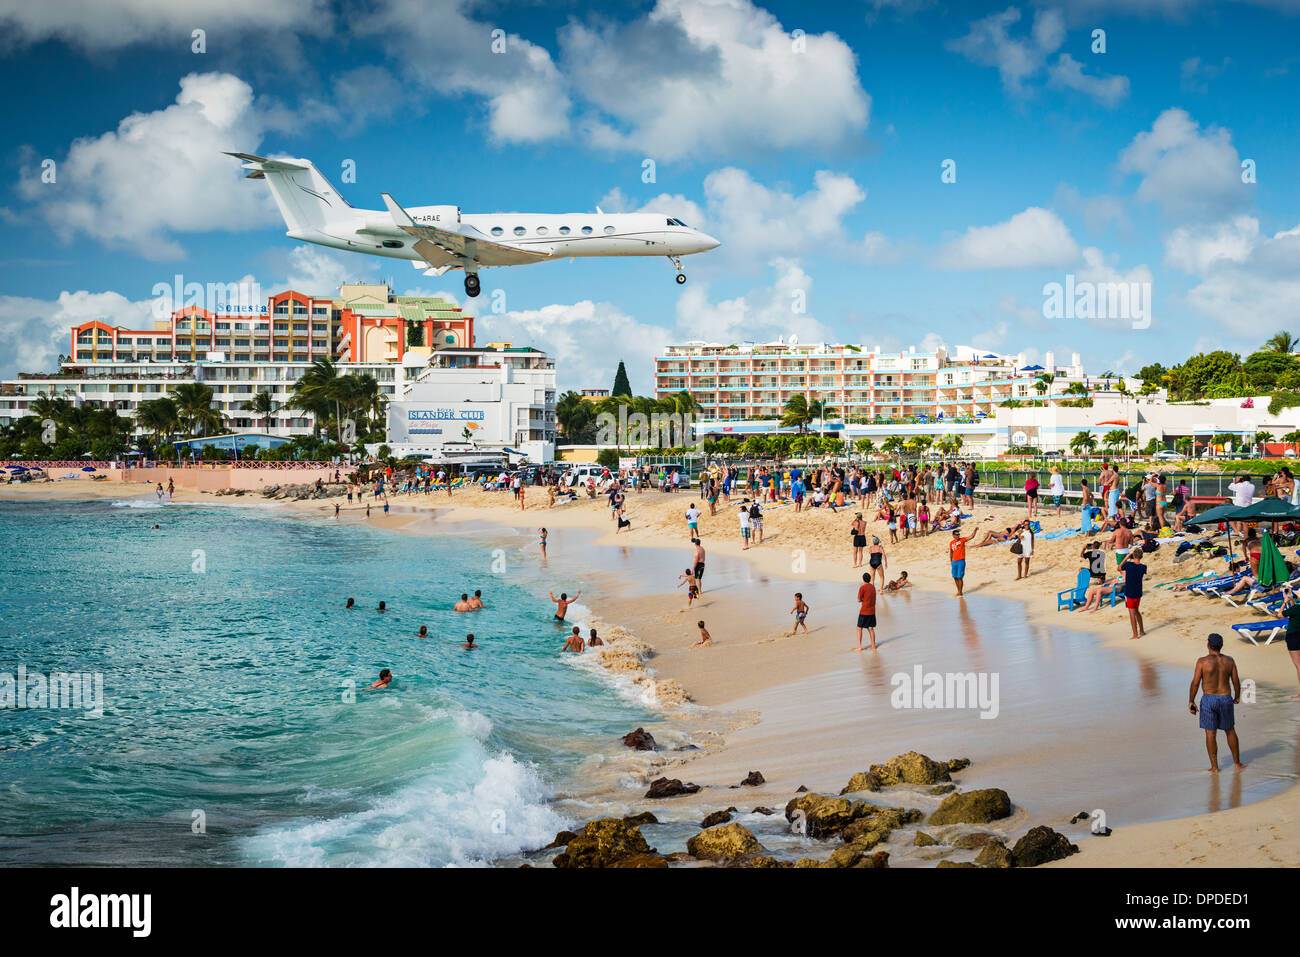 Private jet lands at Maho Beach in Philipsburg, Sint Maarten Stock Photo